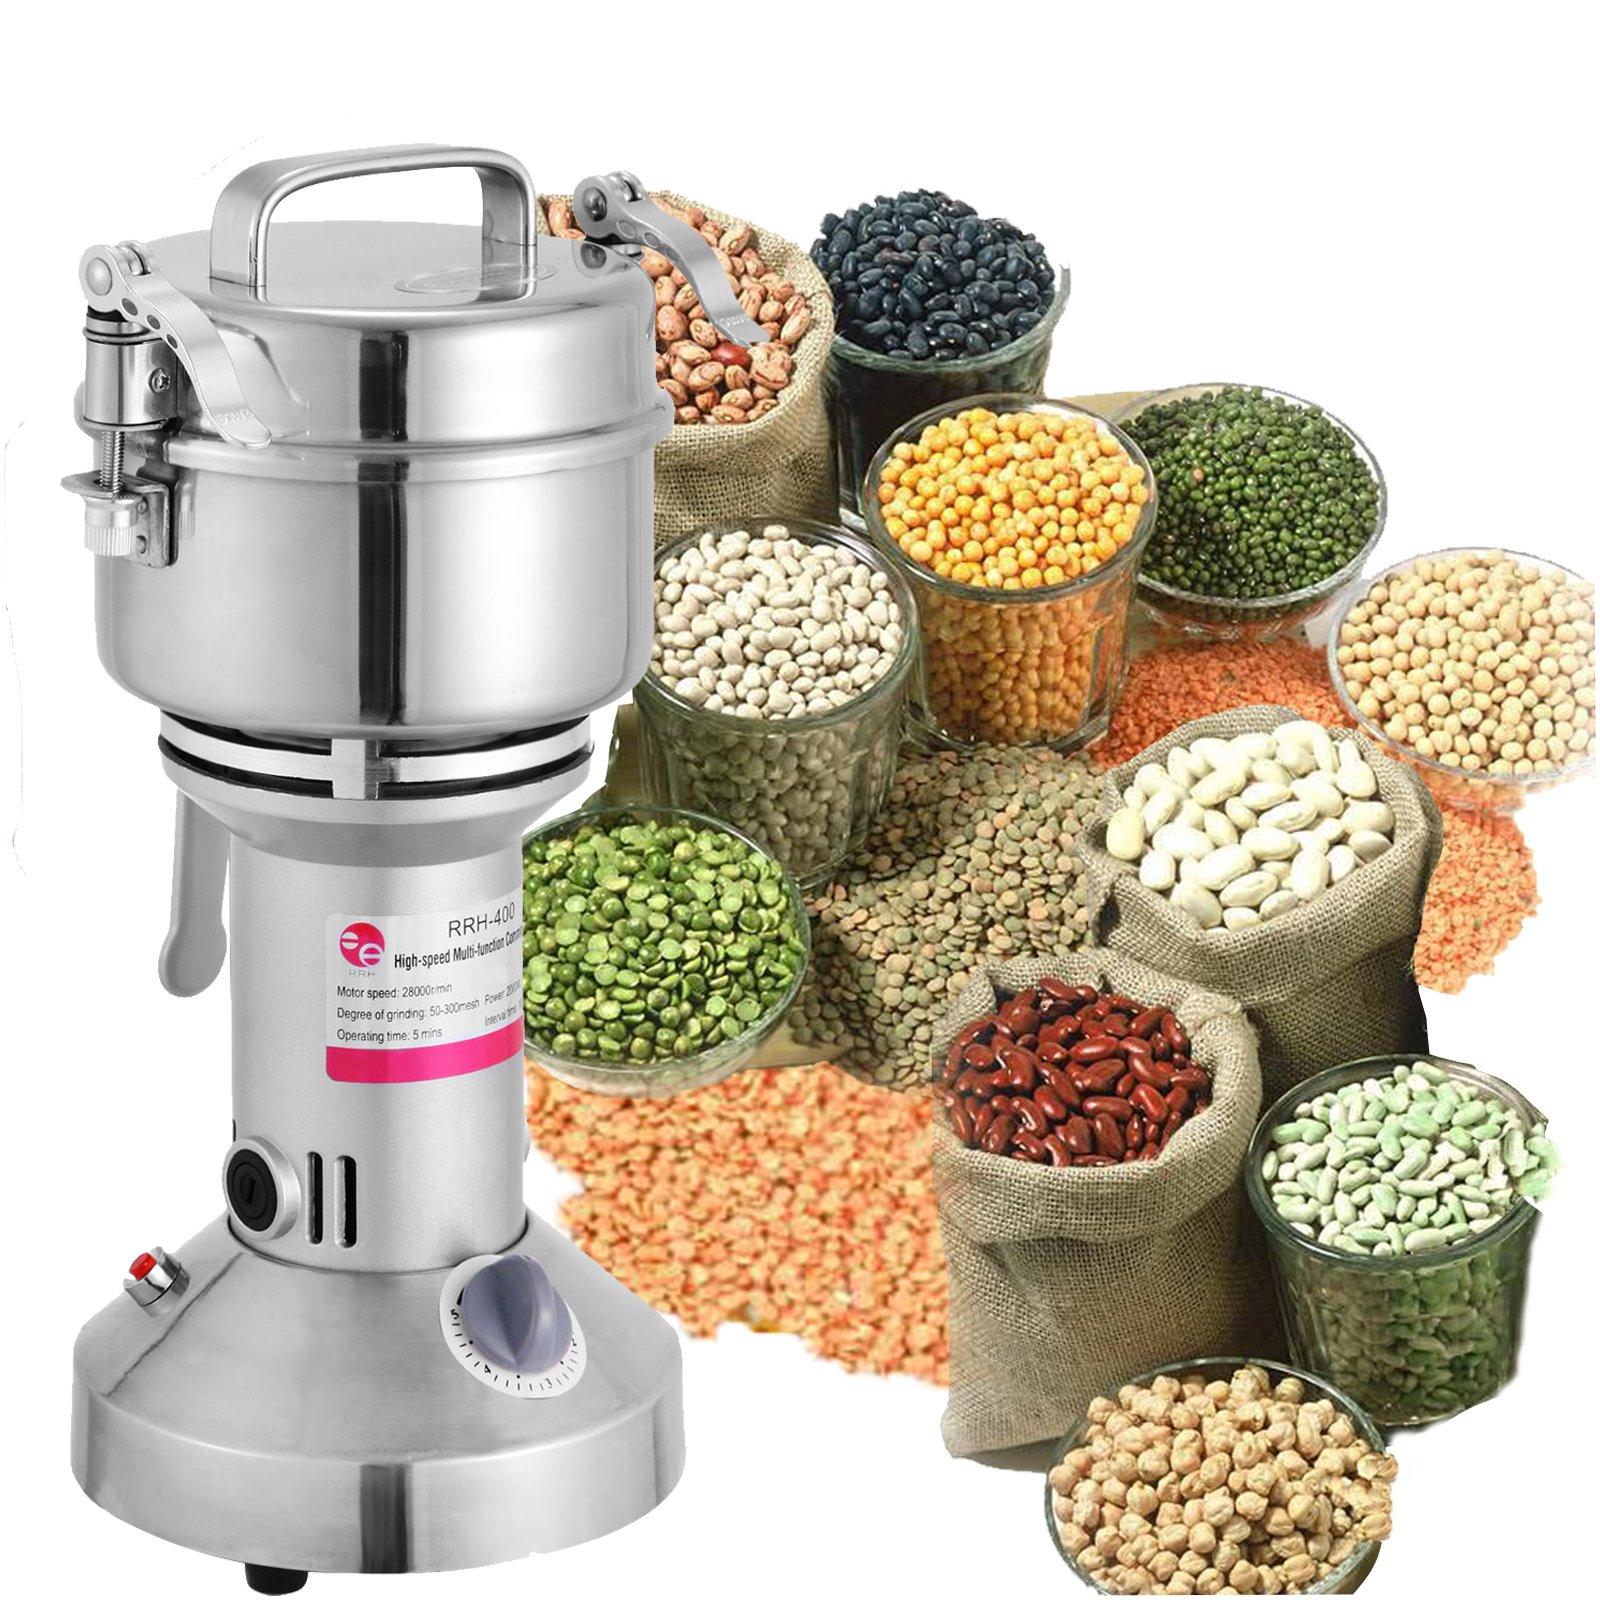 LOVSHARE 350g Electric Mill Herb Grain Grinder 50-300 Mesh Powder Machine 28000 R/Min Superfine Powder Pulverizer for Spice Herbs Grains Coffee Rice Corn Sesame Soybean Fish Feed Pepper Medicine